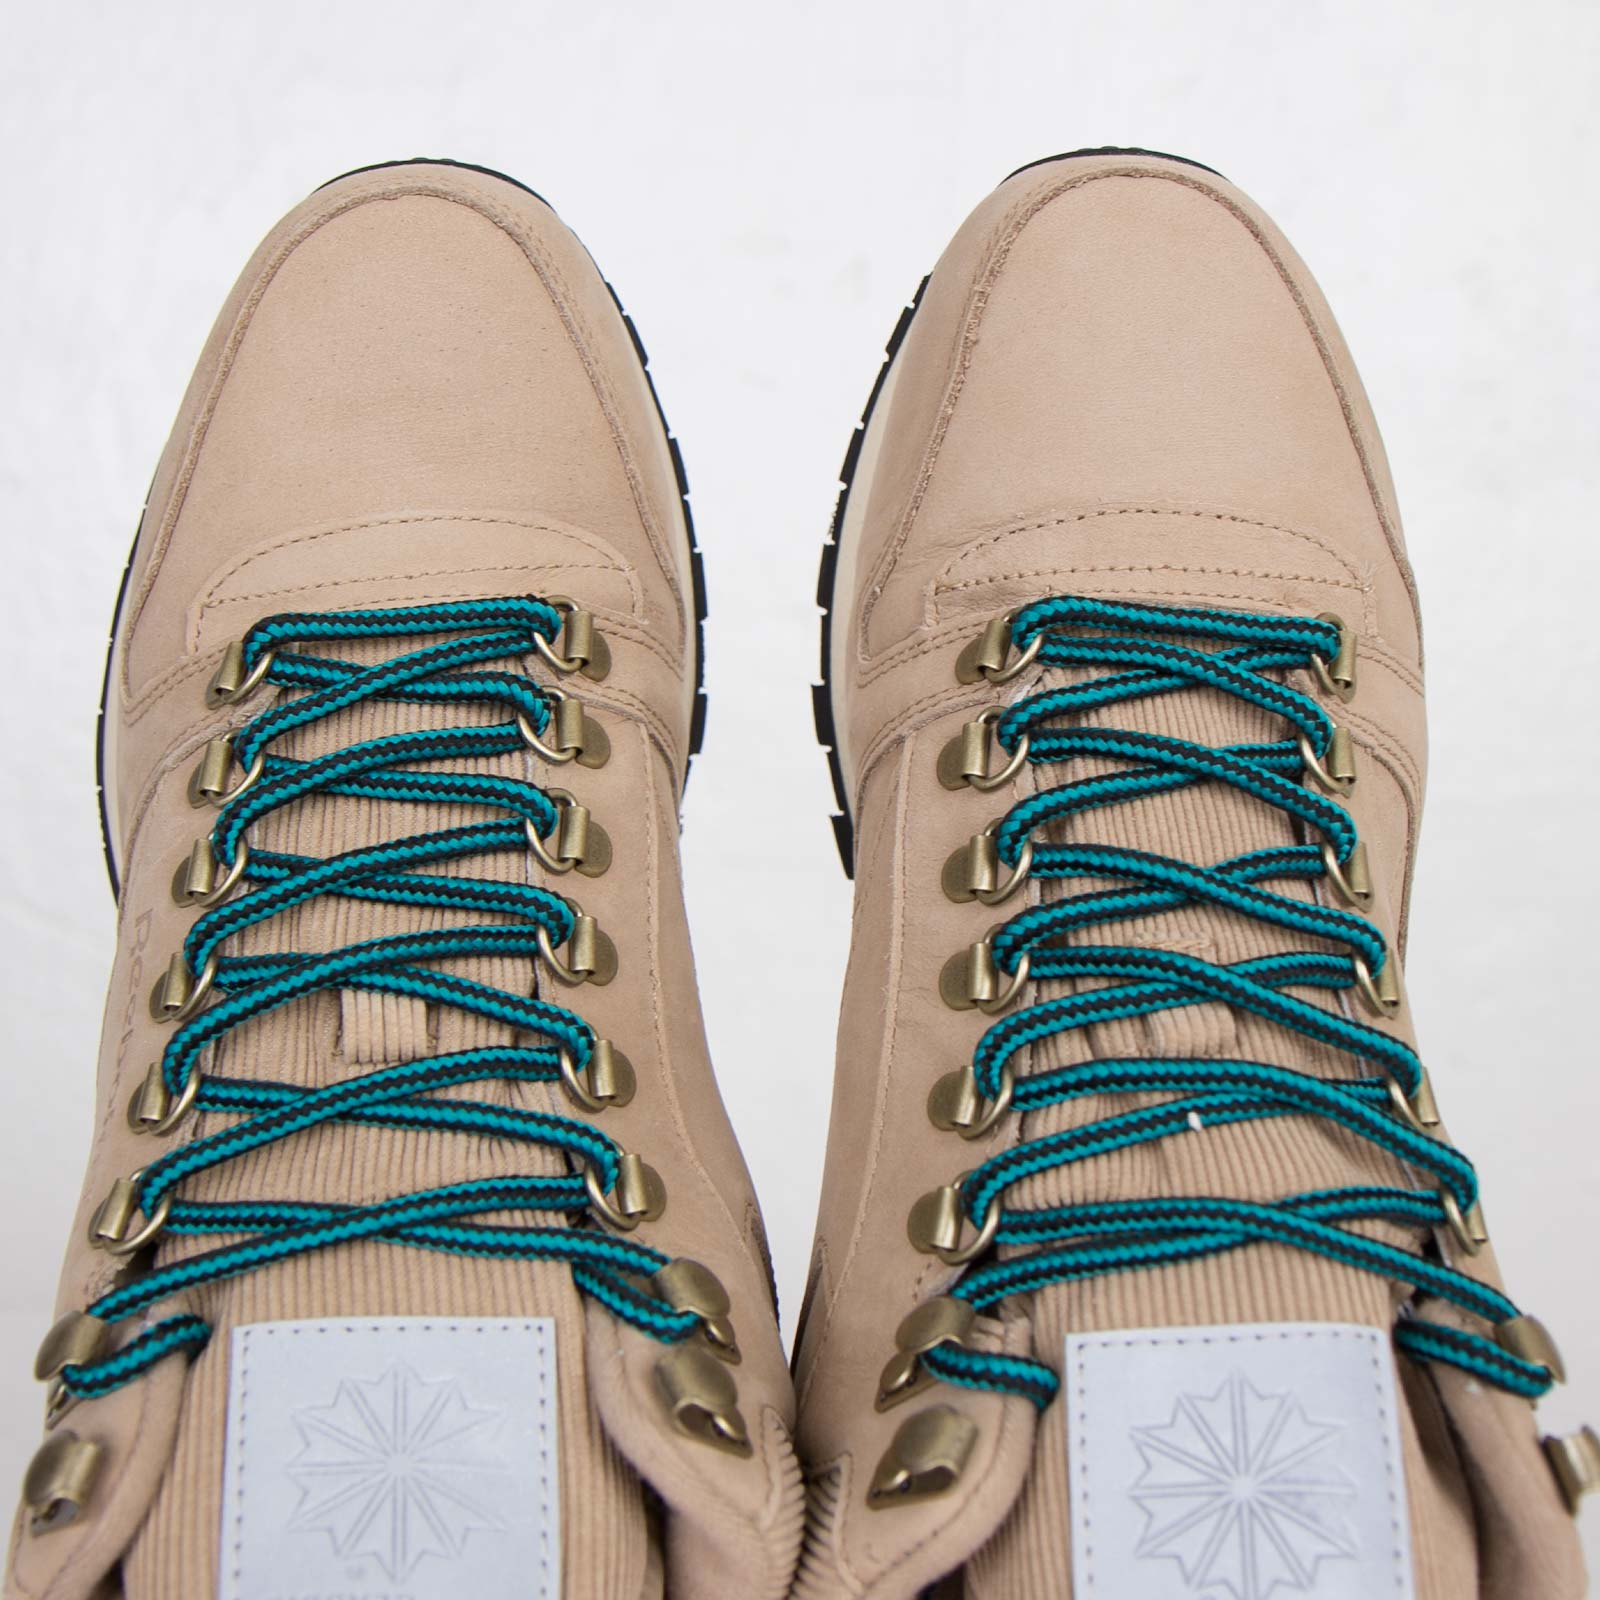 89baecc29f9 Reebok Classic Leather Mid Gore-Tex - V48355 - Sneakersnstuff ...